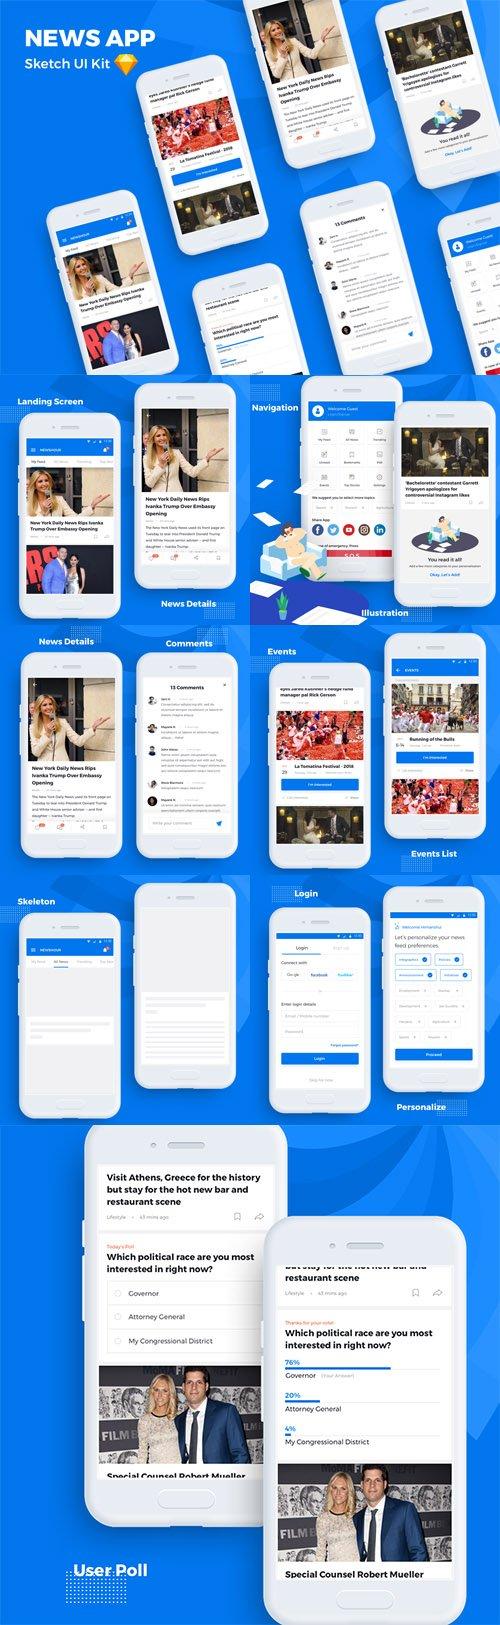 News App - Sketch UI Kit